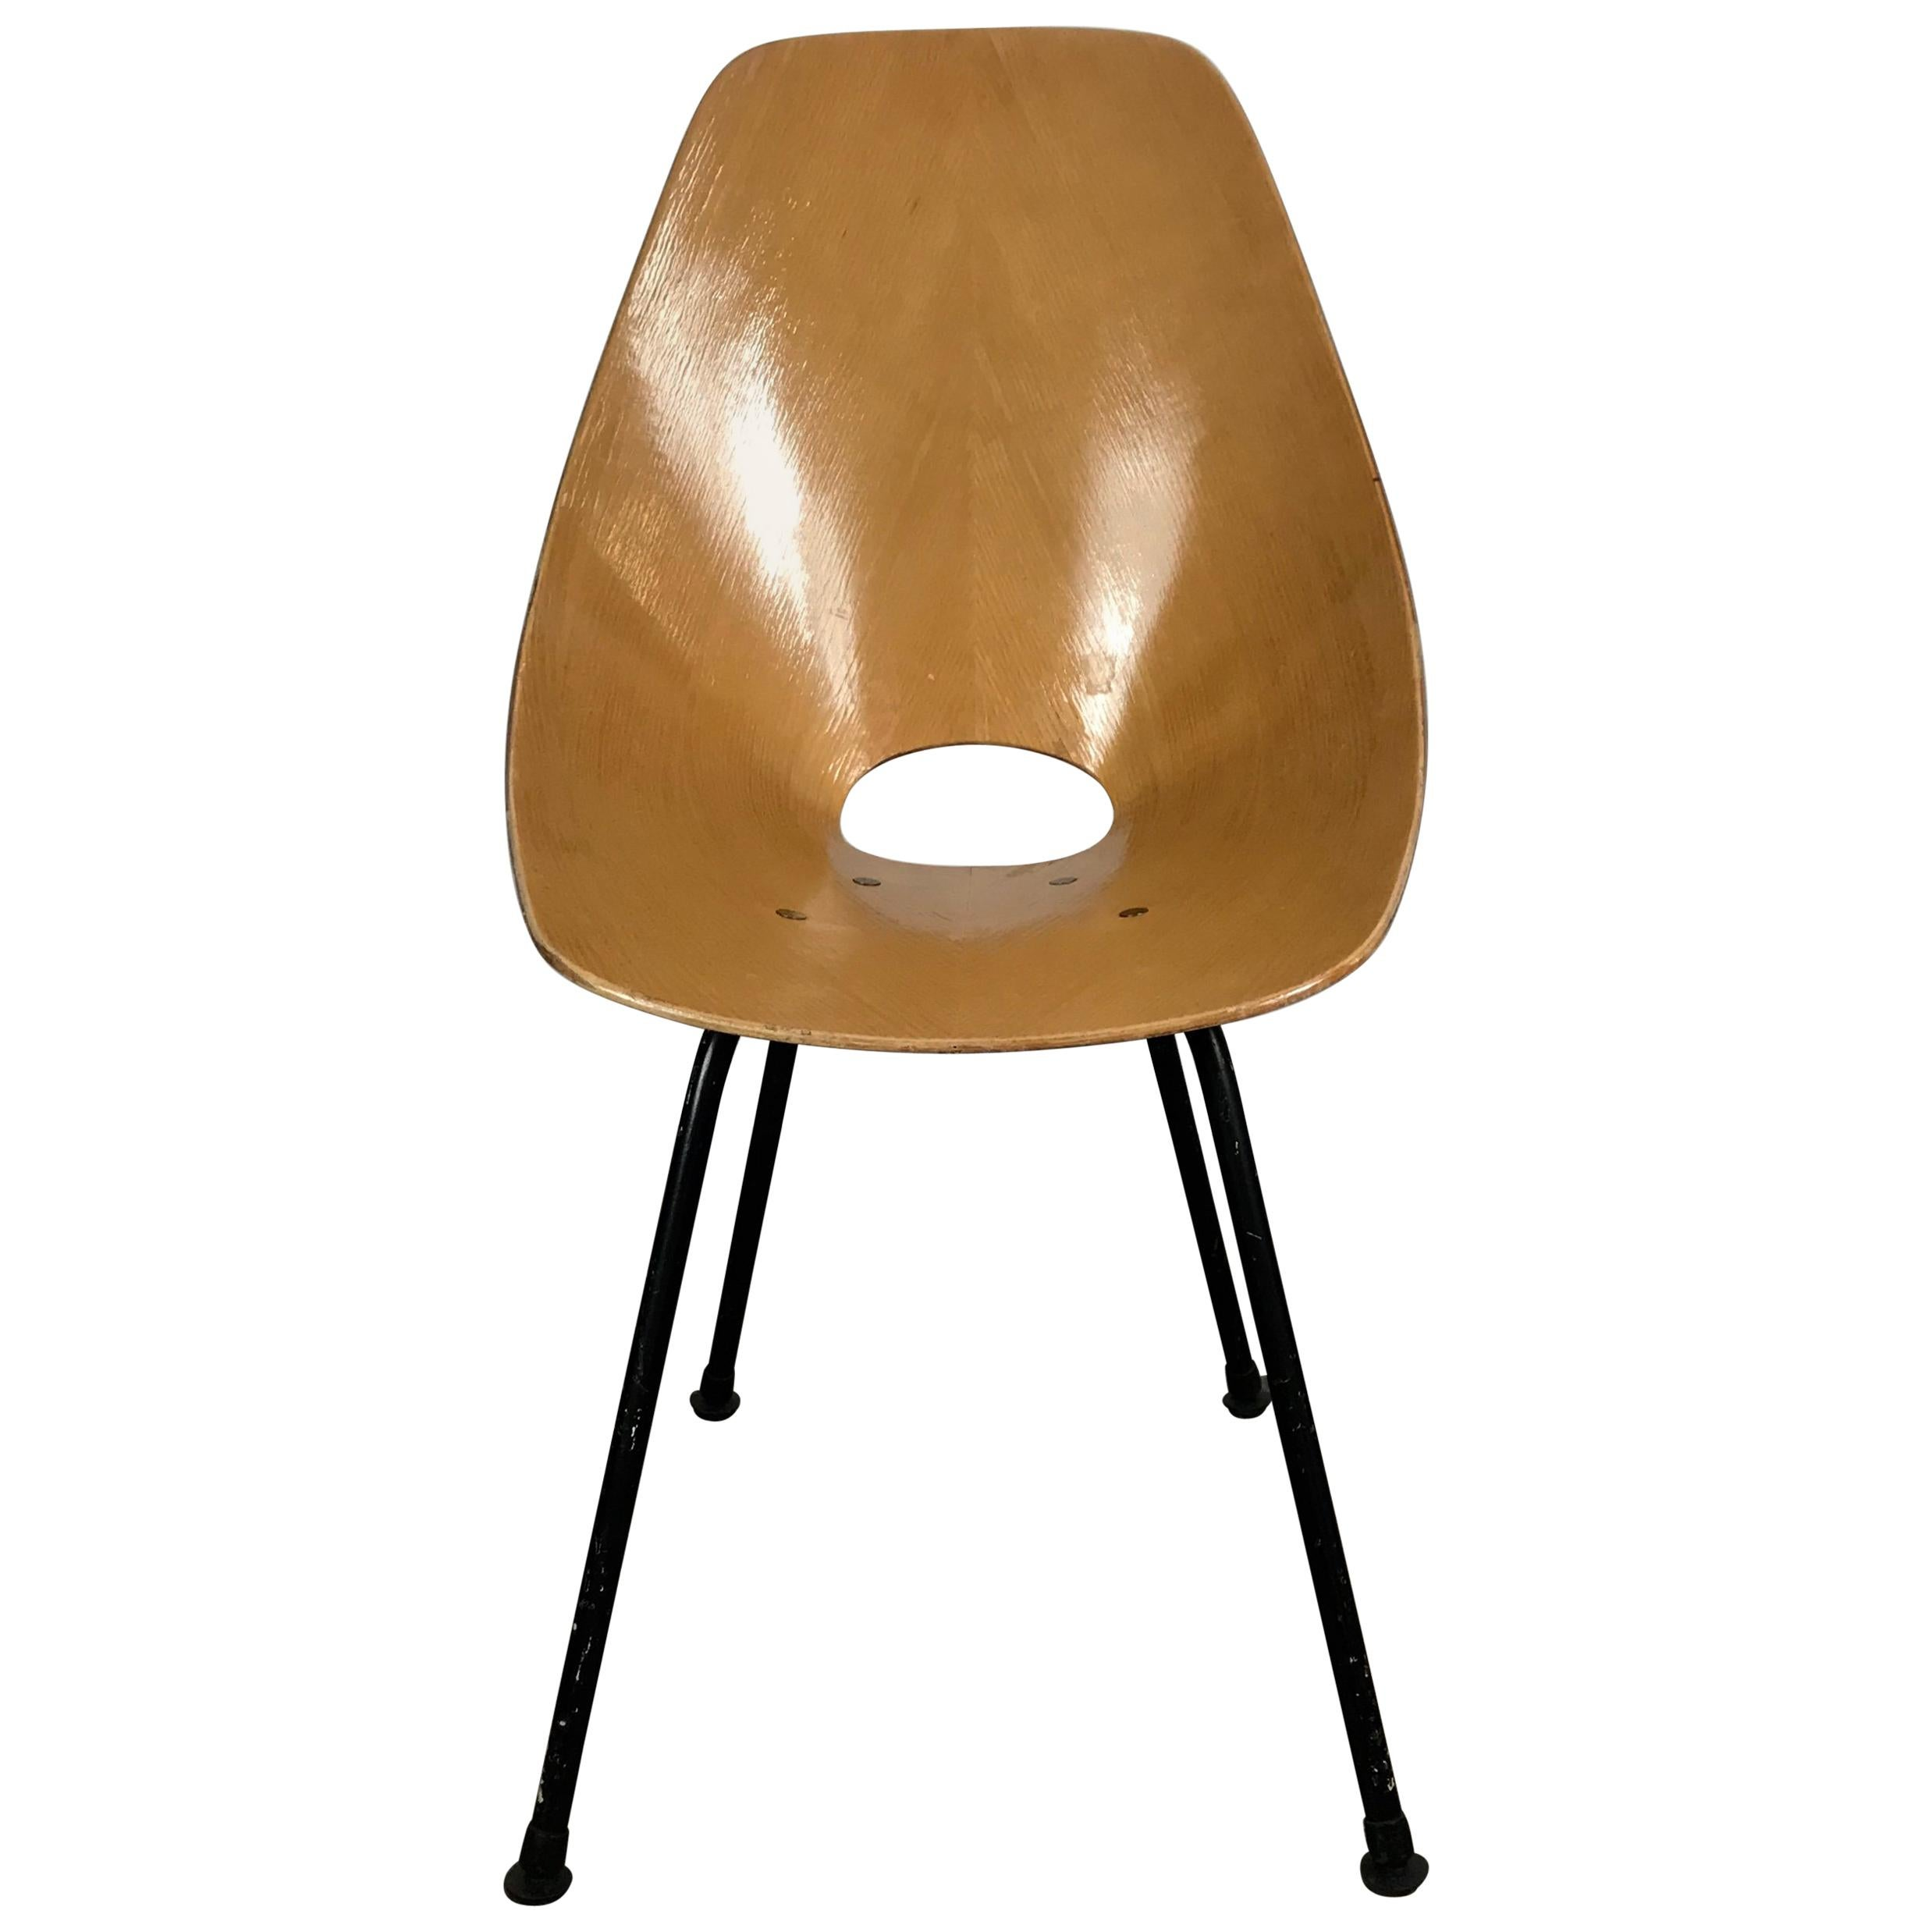 Italian Modernist Side Chair by Vittorio Nobili for Fratelli Tagliabue